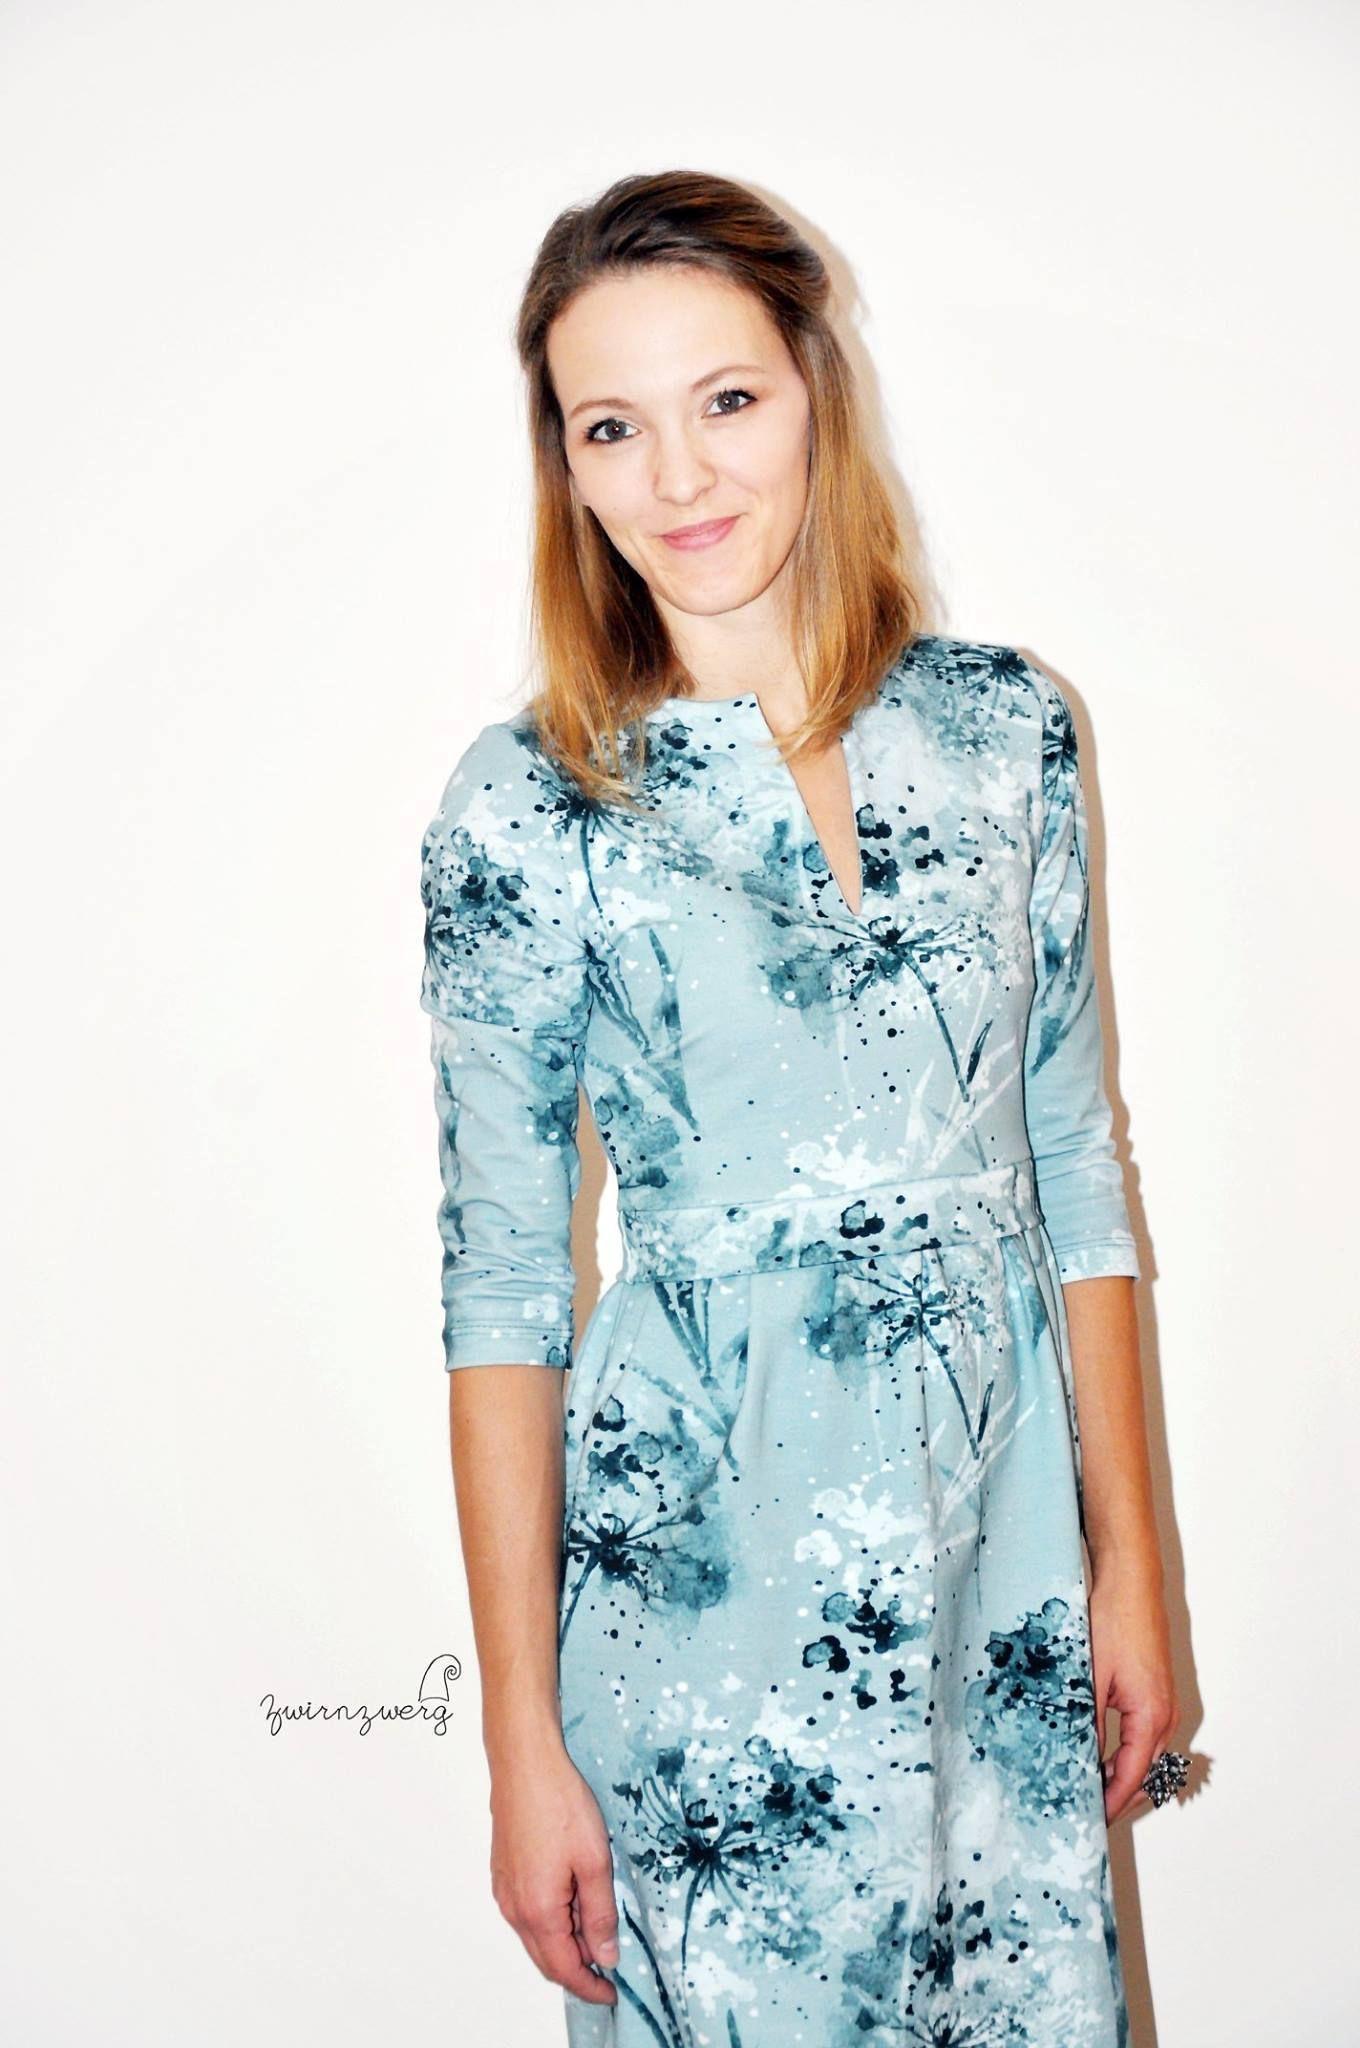 Designer Genial Edle Damen Kleider Vertrieb13 Wunderbar Edle Damen Kleider Stylish